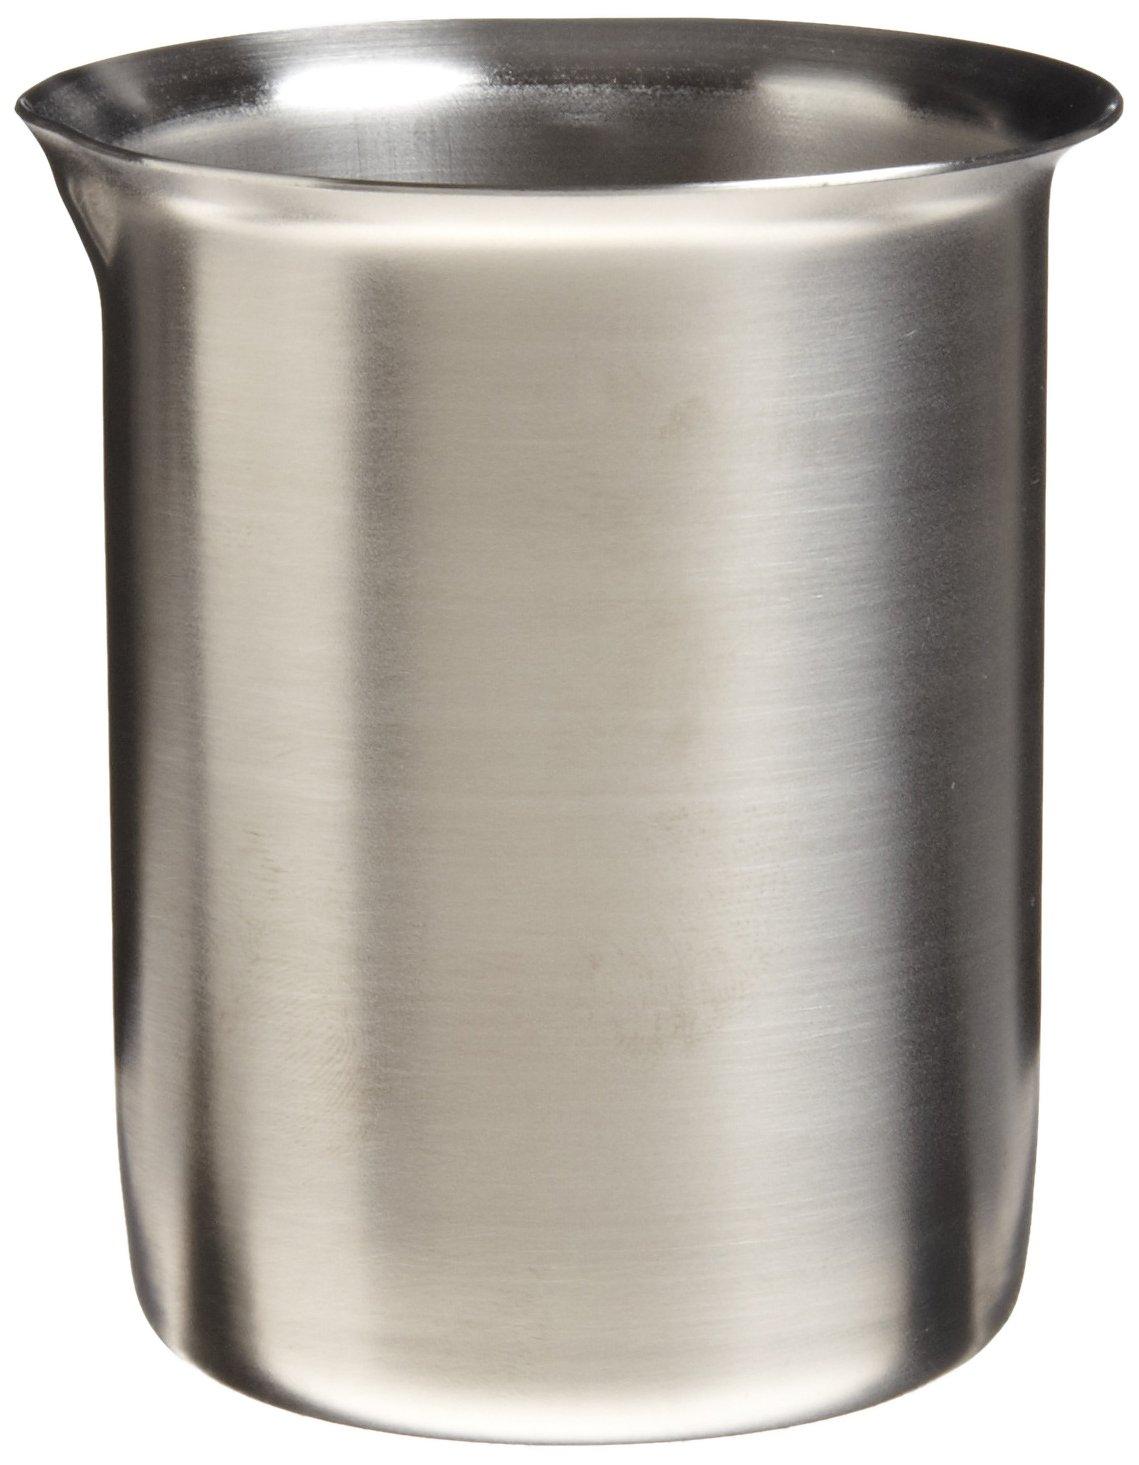 Polar Popular Max 64% OFF brand Ware 250B Stainless Steel Griffin 250 Style Cap Beaker mL